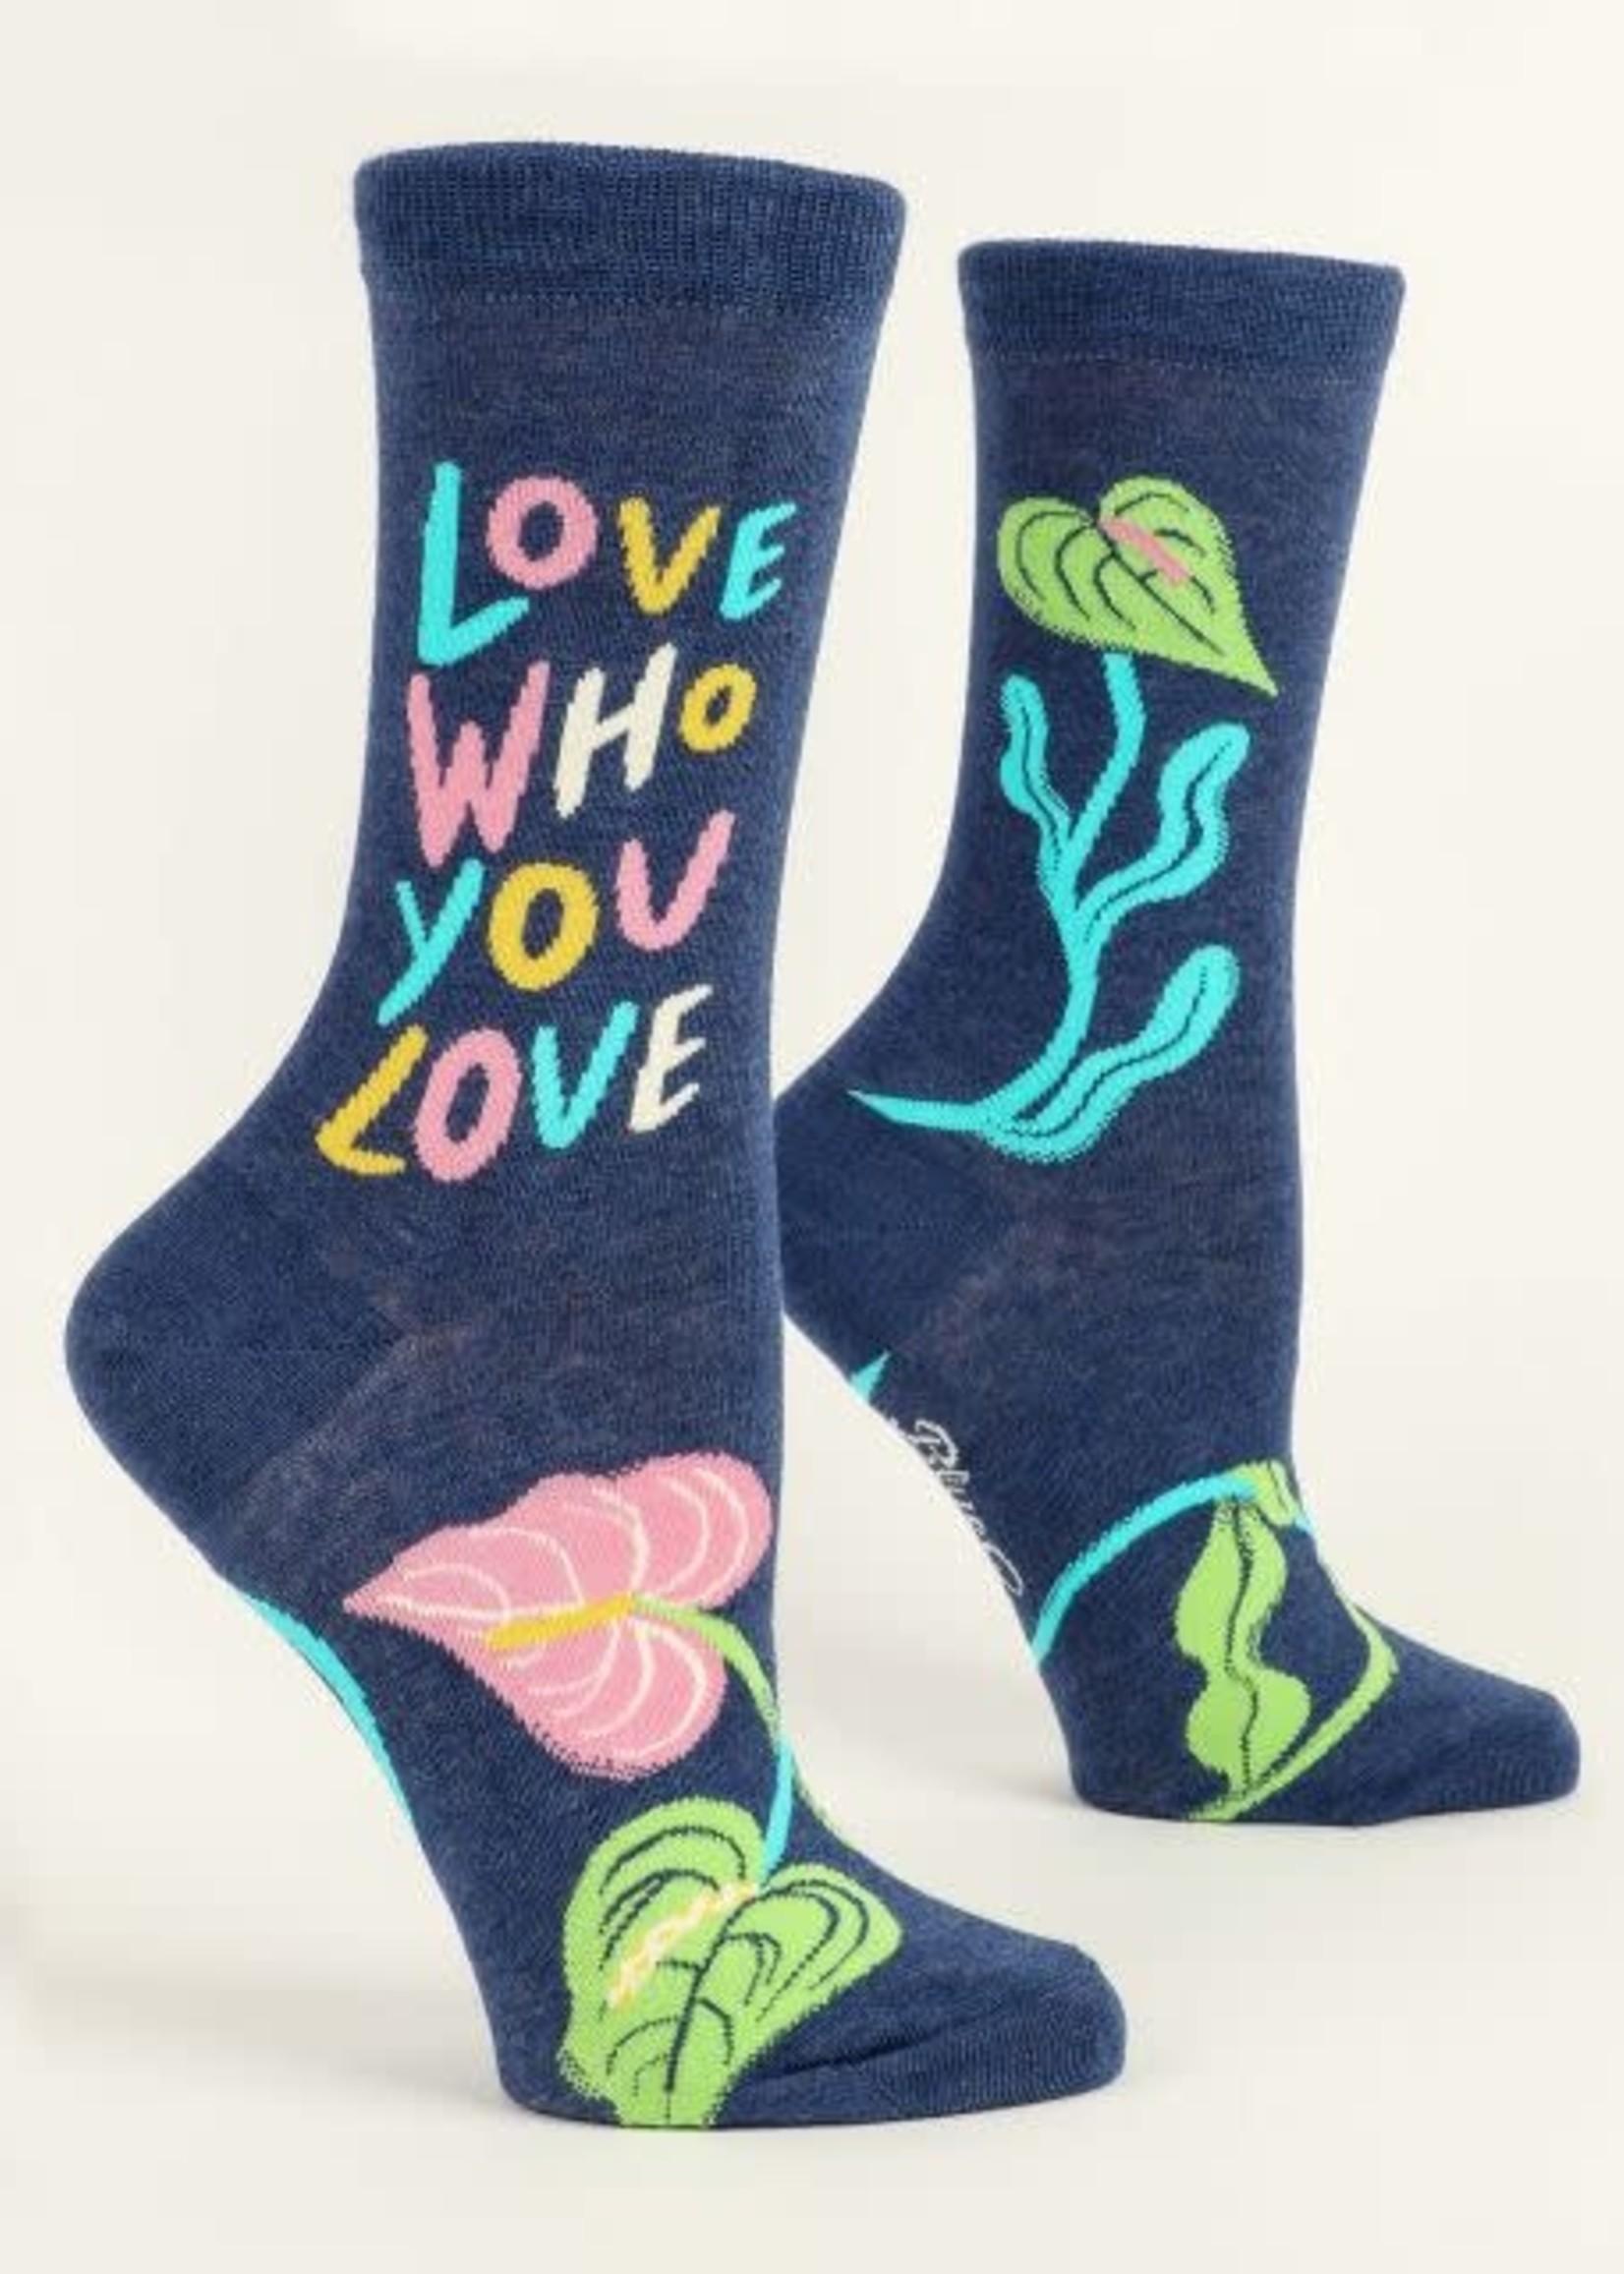 Blue Q Blue Q Women's Socks Love Who You Love